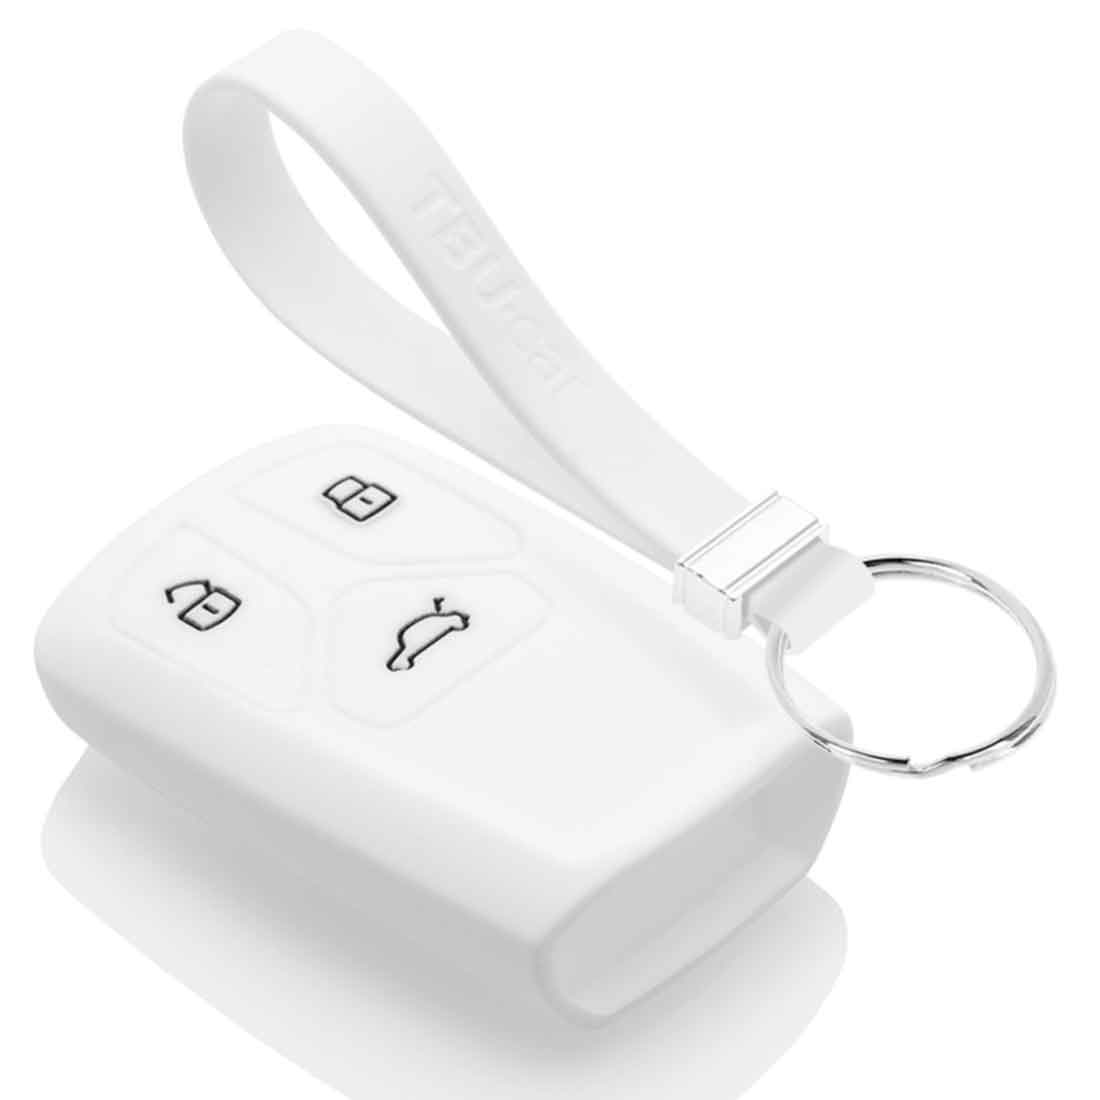 TBU car TBU car Autoschlüssel Hülle kompatibel mit Audi 3 Tasten (Keyless Entry) - Schutzhülle aus Silikon - Auto Schlüsselhülle Cover in Weiß